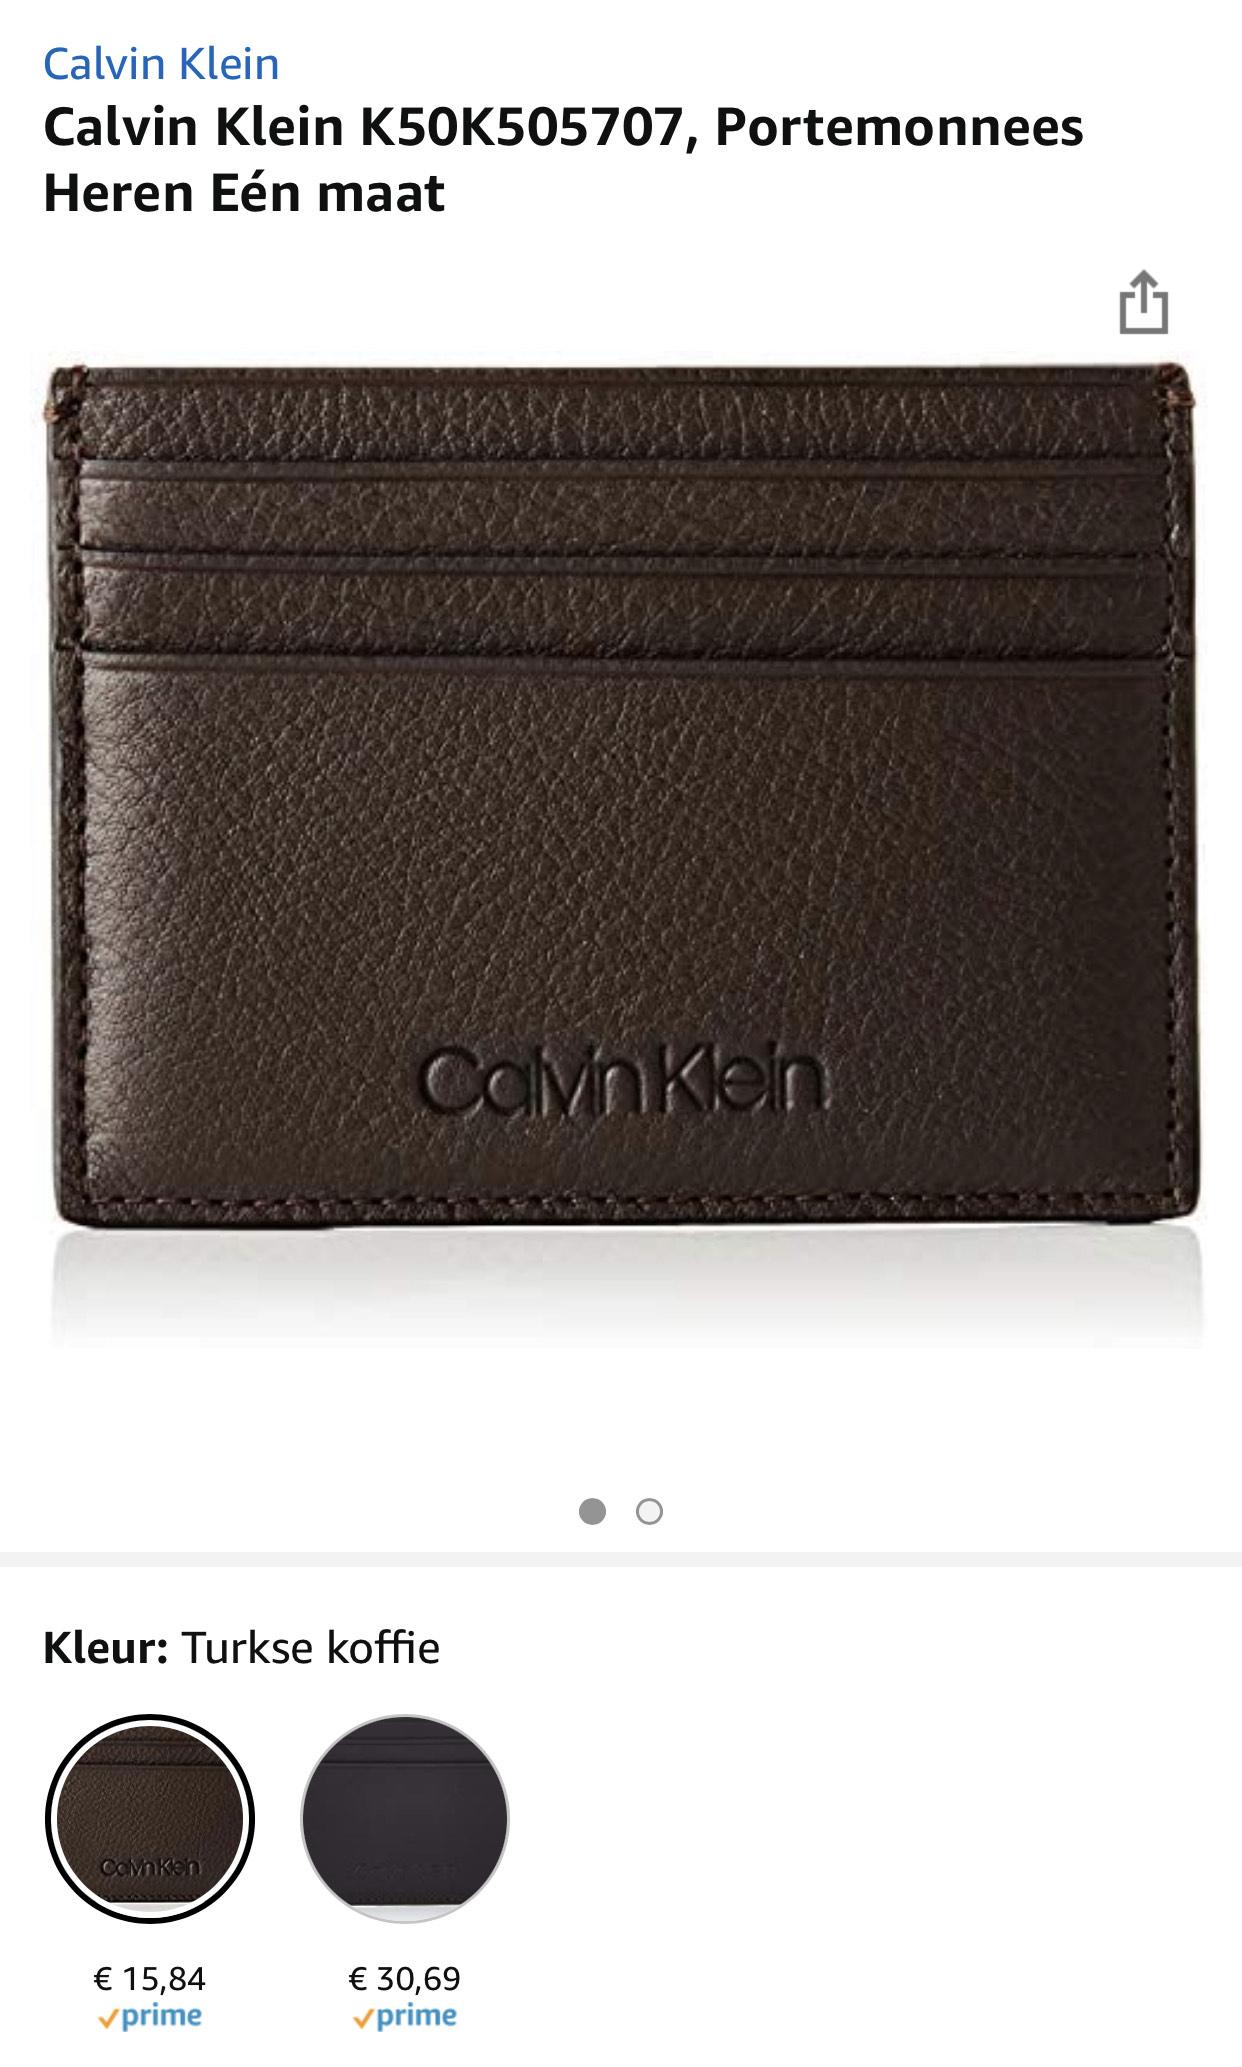 Calvin Klein Pasjeshouder vanaf €15,84